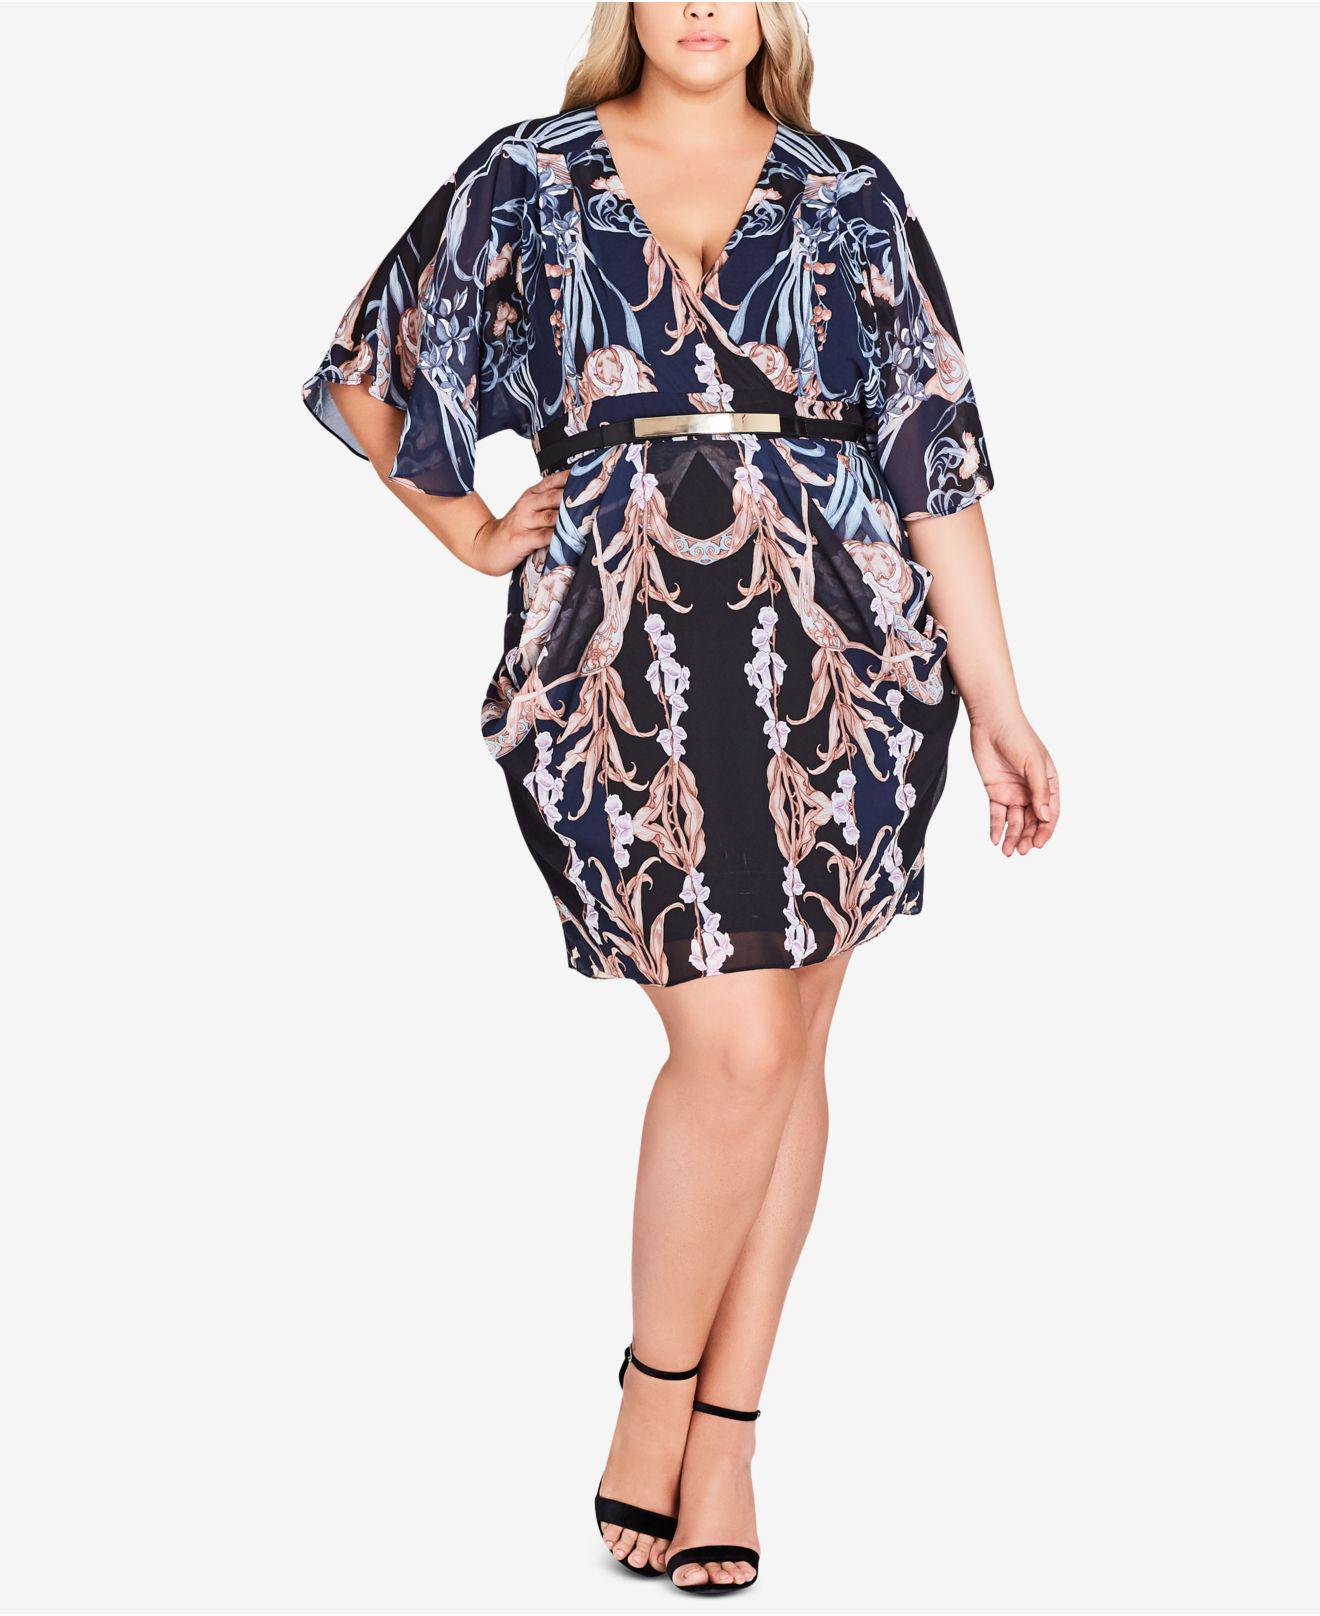 261b8234d22c7 City Chic. Women s Trendy Plus Size Belted Drape Dress